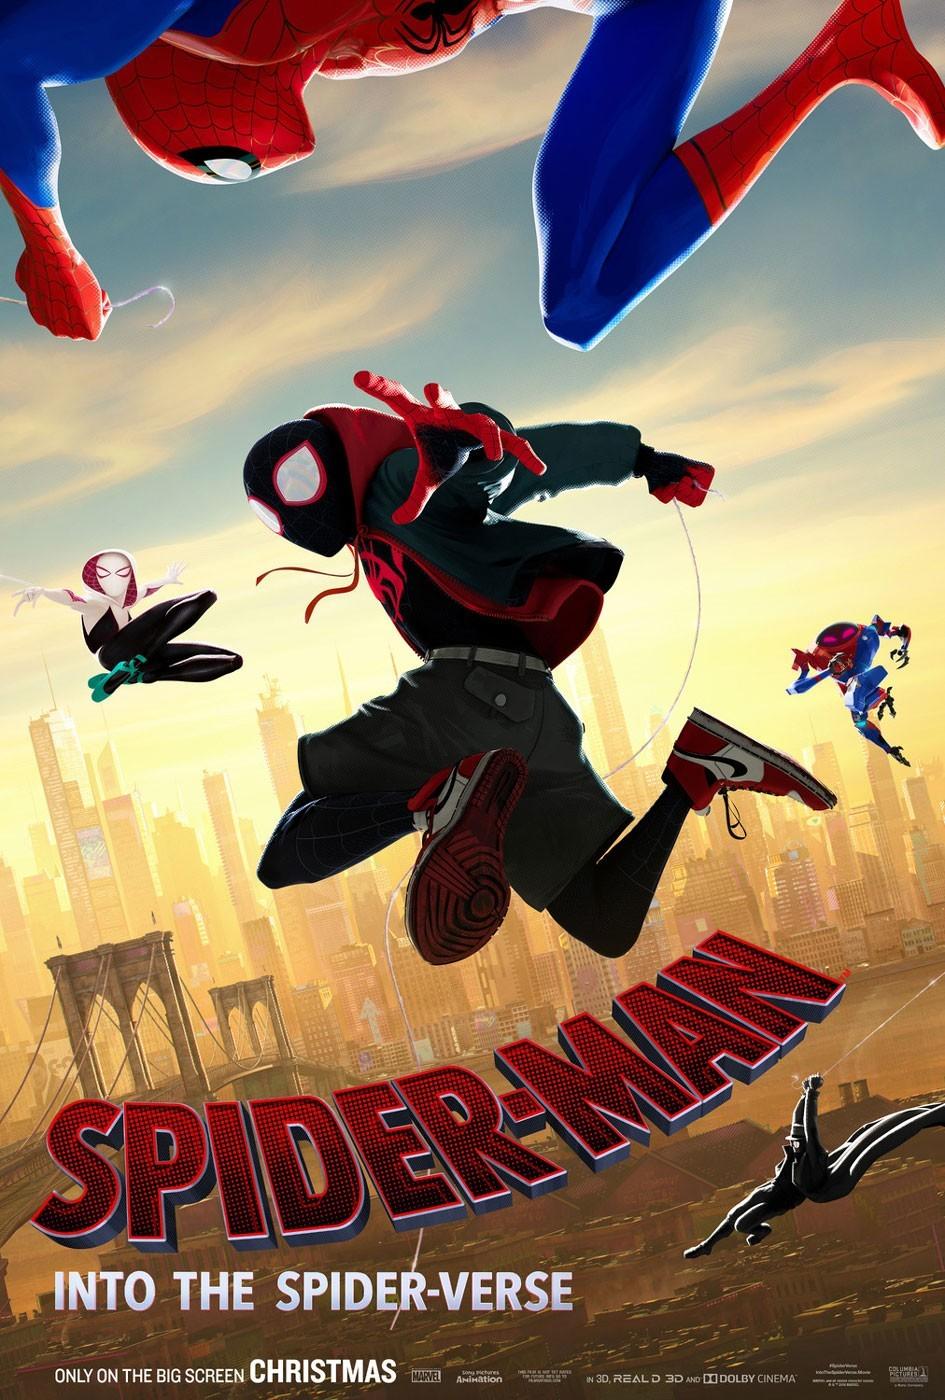 Película - Spider-Man: Into the Spider-Verse - Bob Persichetti, Peter Ramsey, Rodney Rothman (2018)